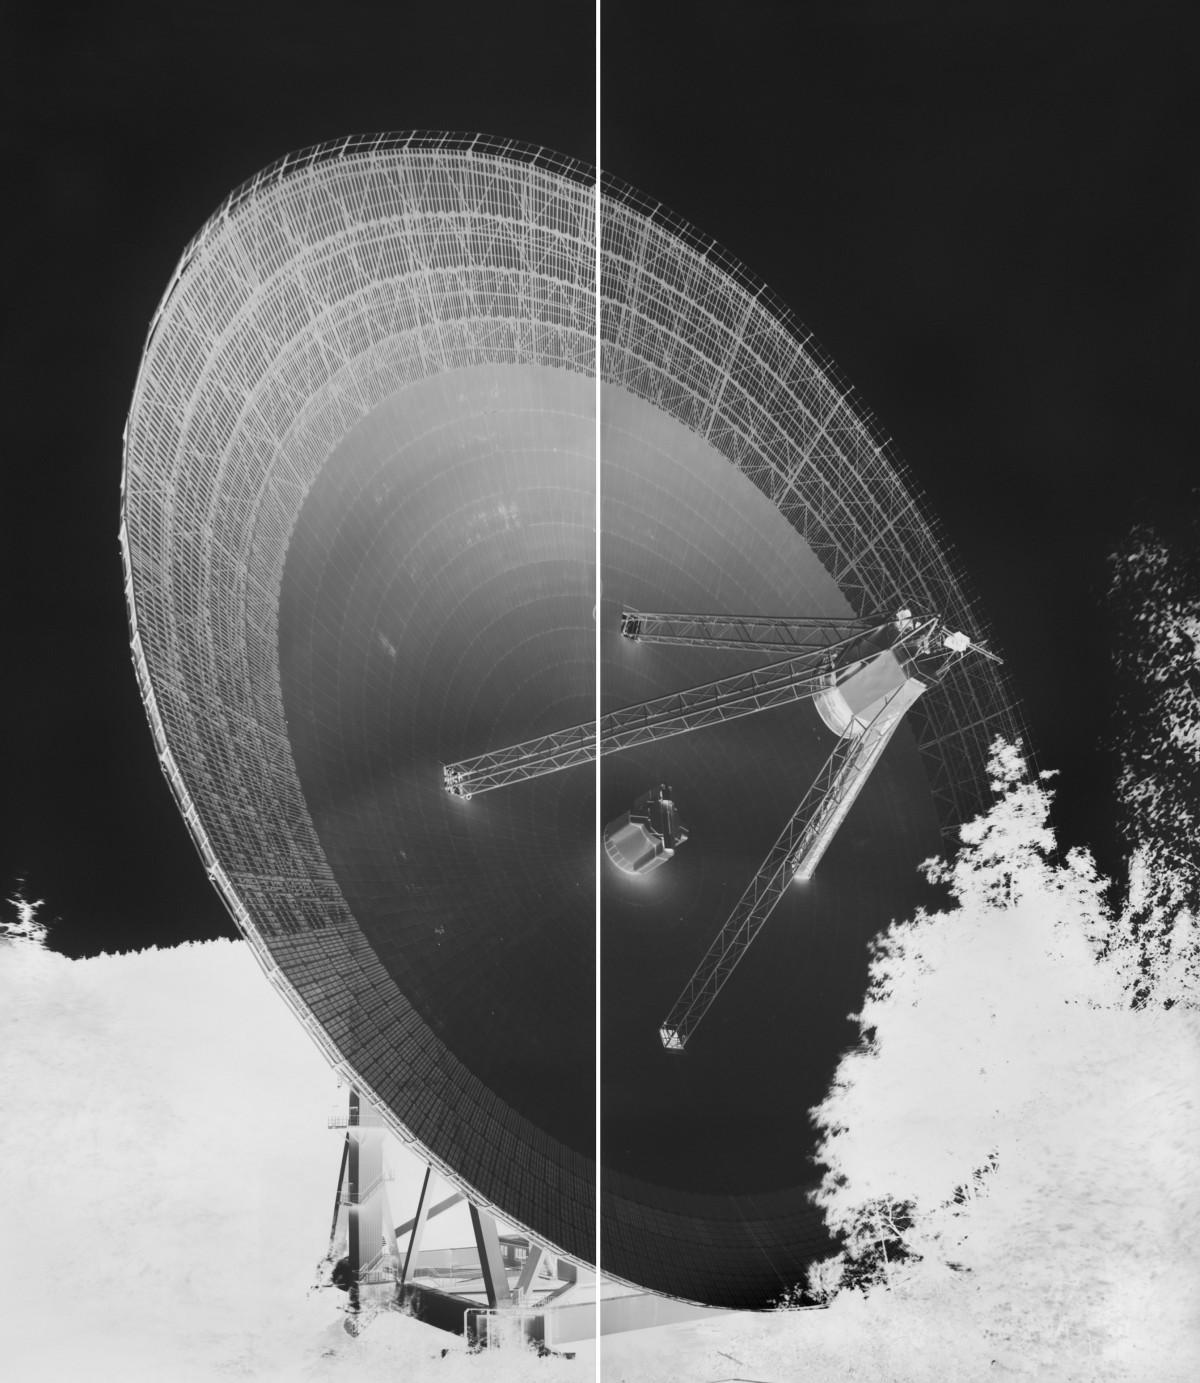 Very Lutter, Radio Telescope, Effelsberg, XV: September 12, 2013. Silver gelatine print. Courtesy Gagosian Gallery.